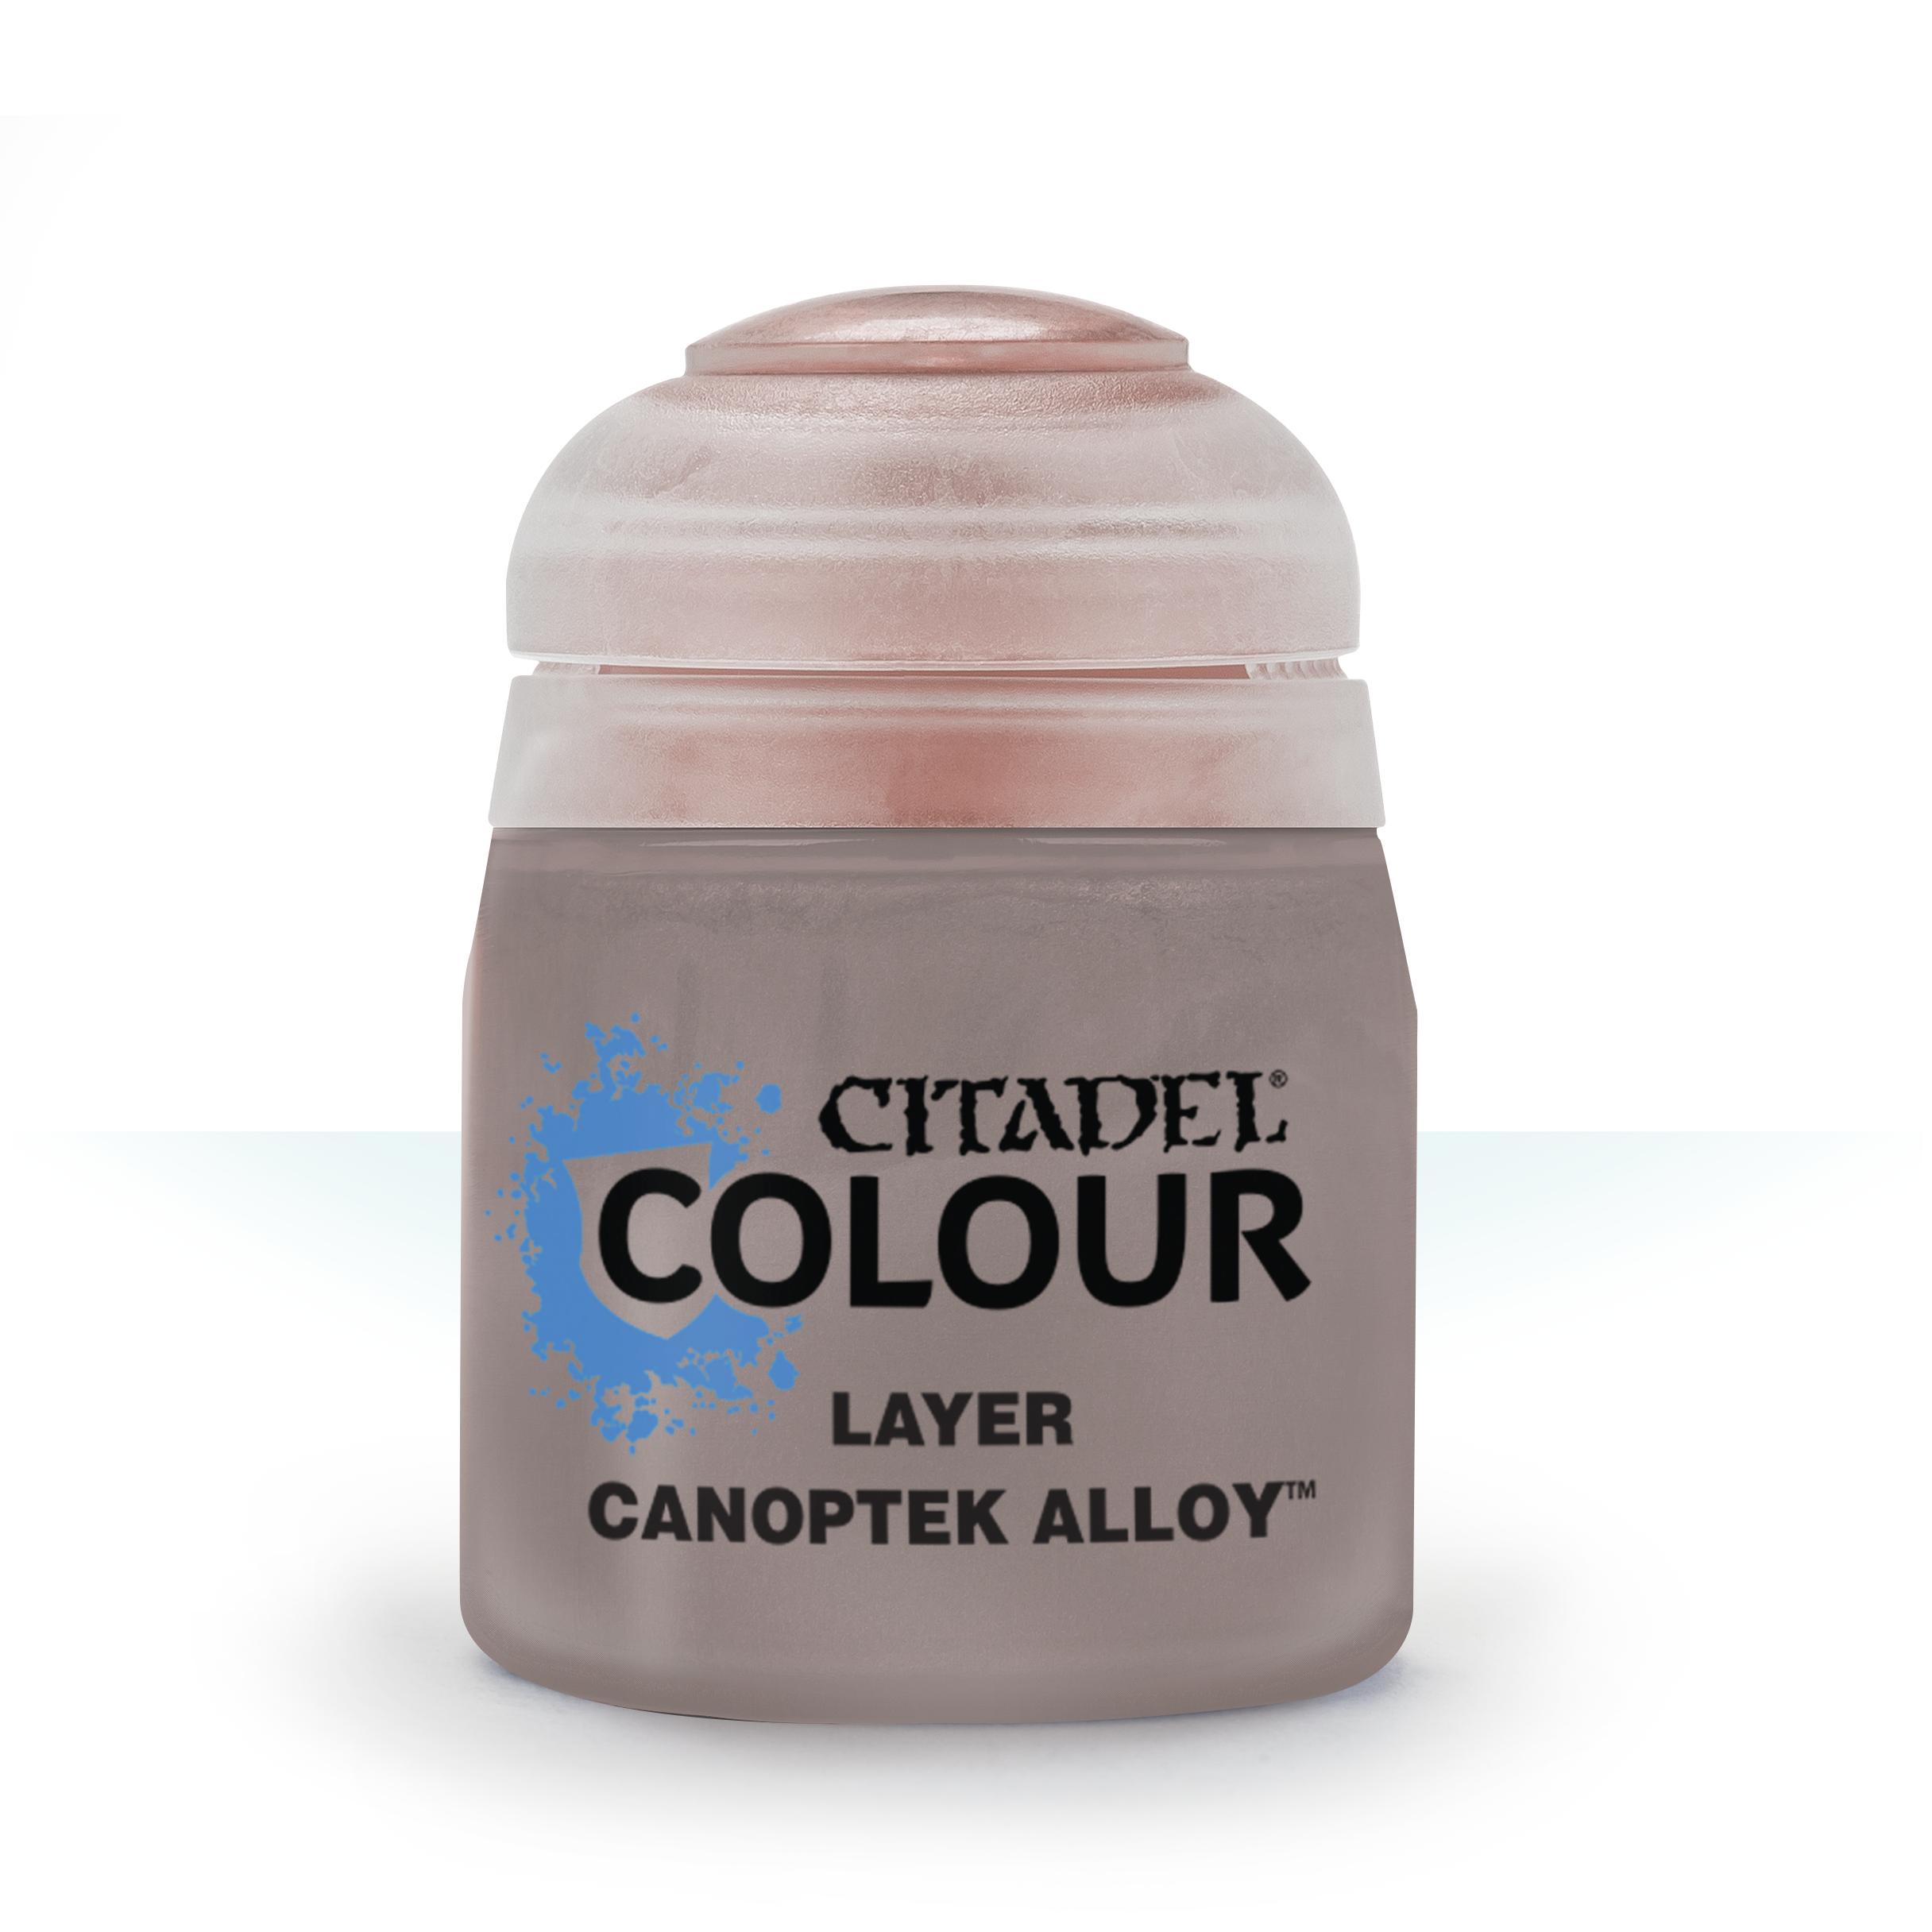 Canoptek Alloy, Citadel Layer 12ml